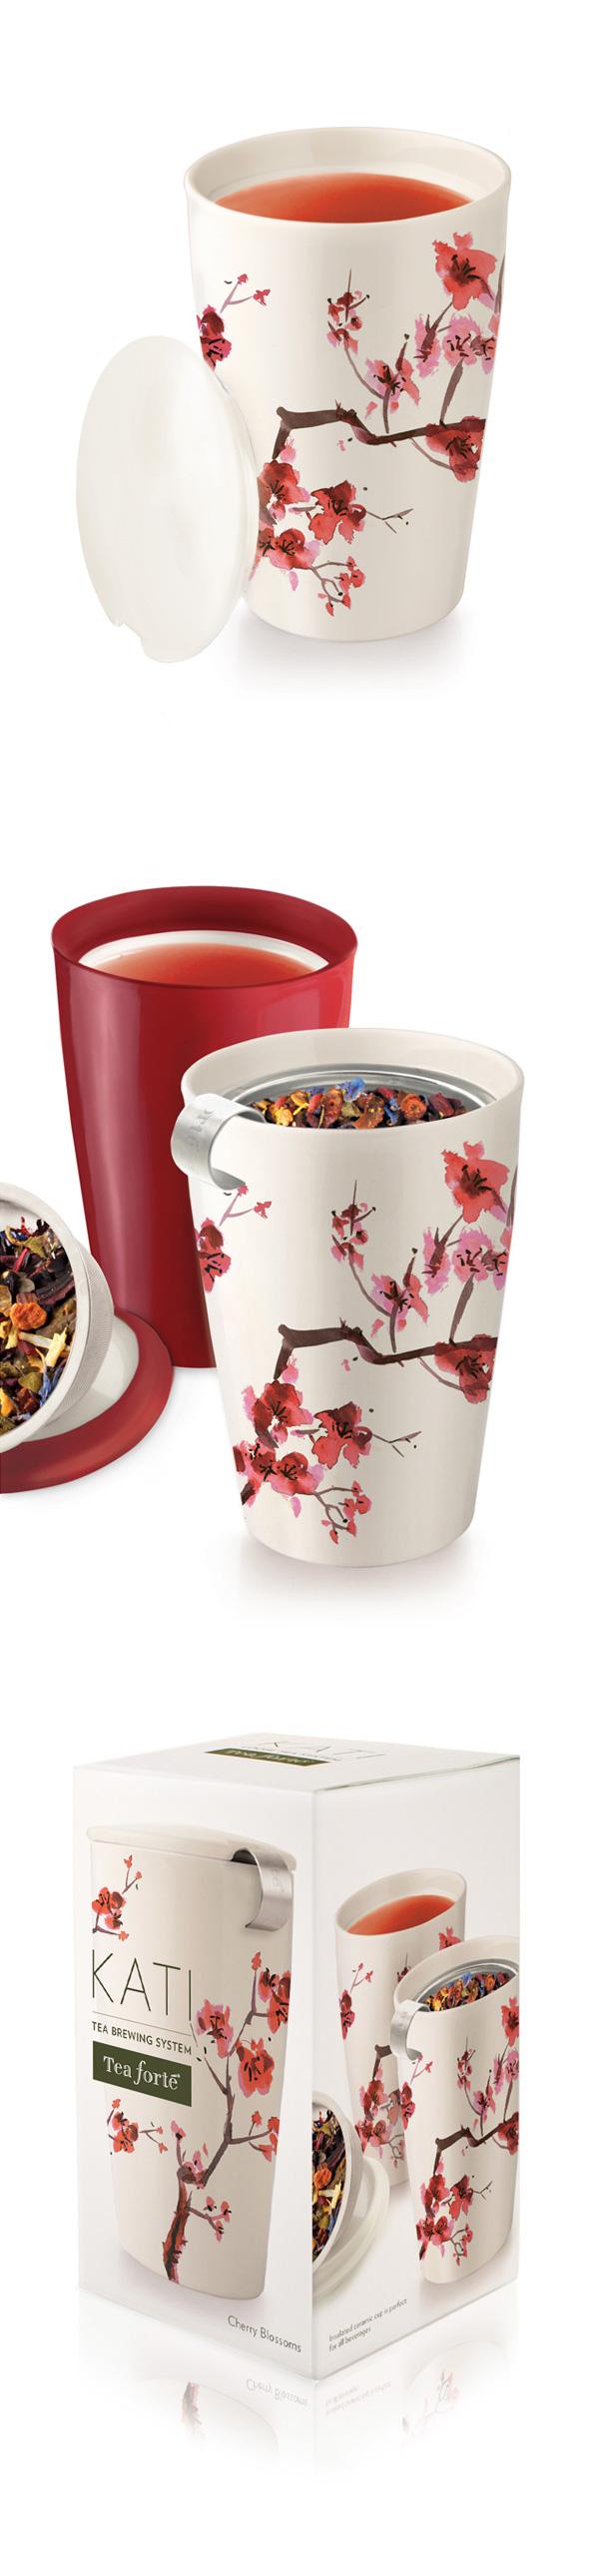 Tea Forte 卡緹茗茶杯 櫻花